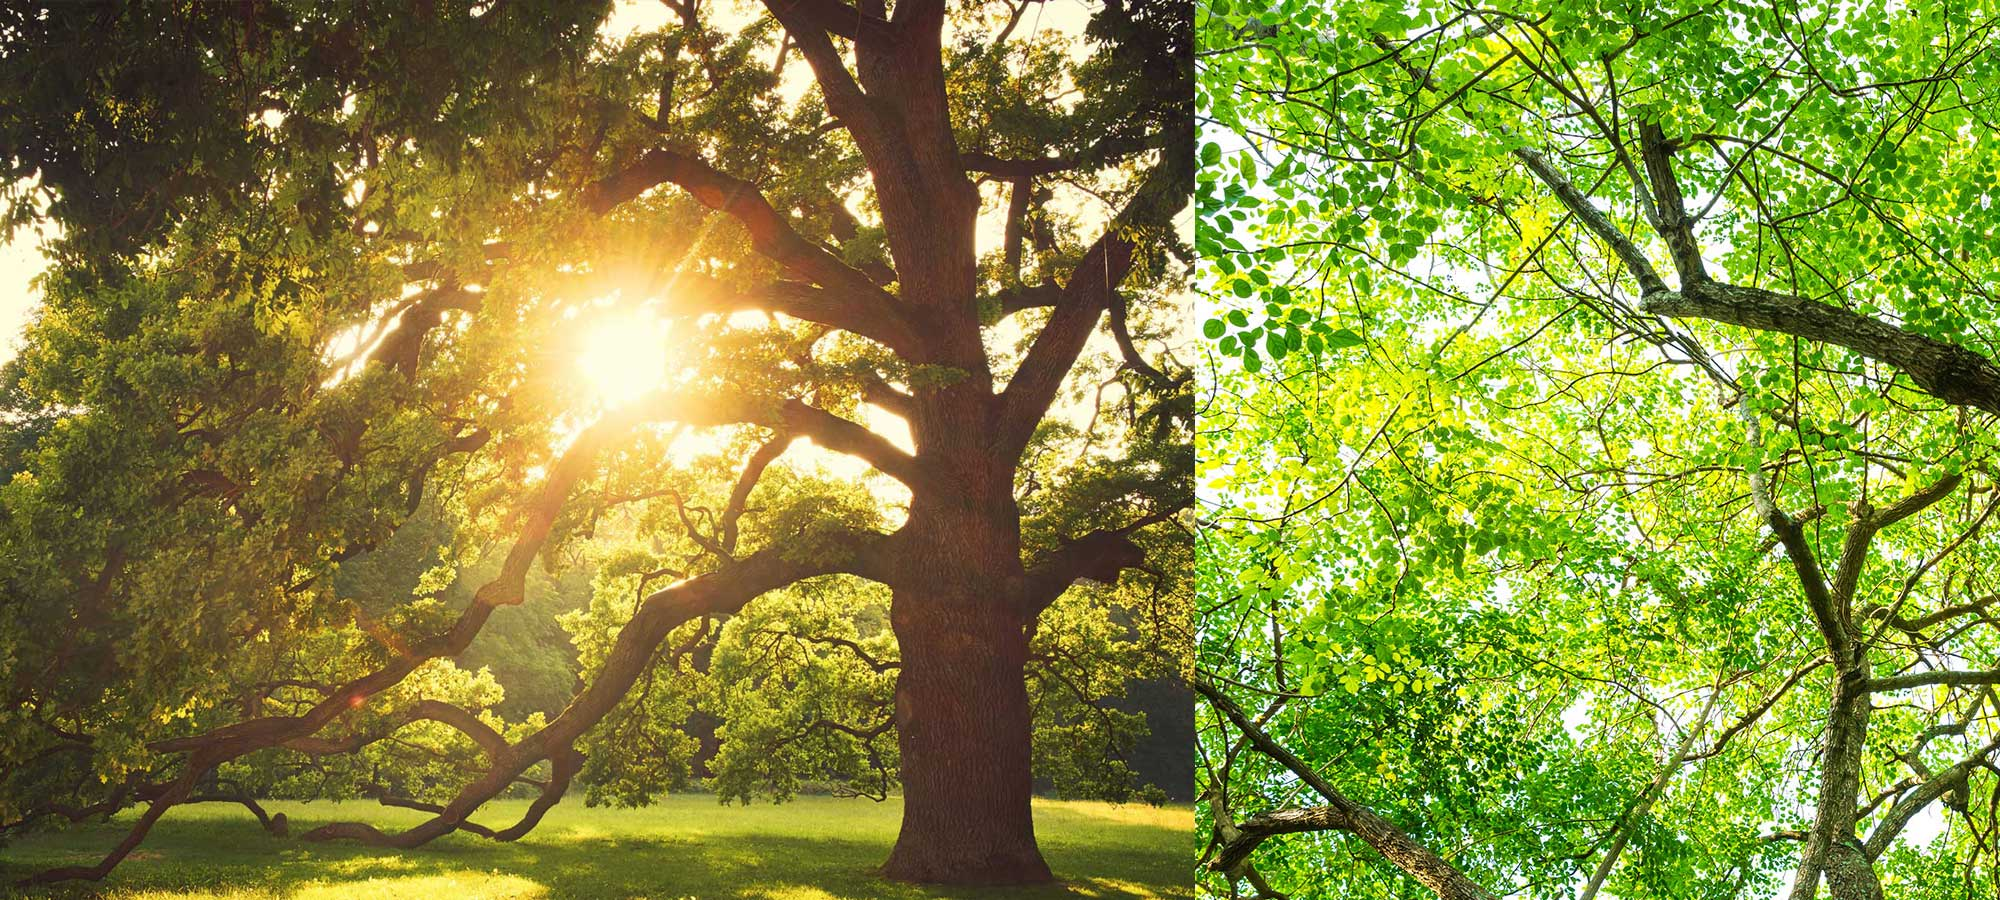 arbre mature